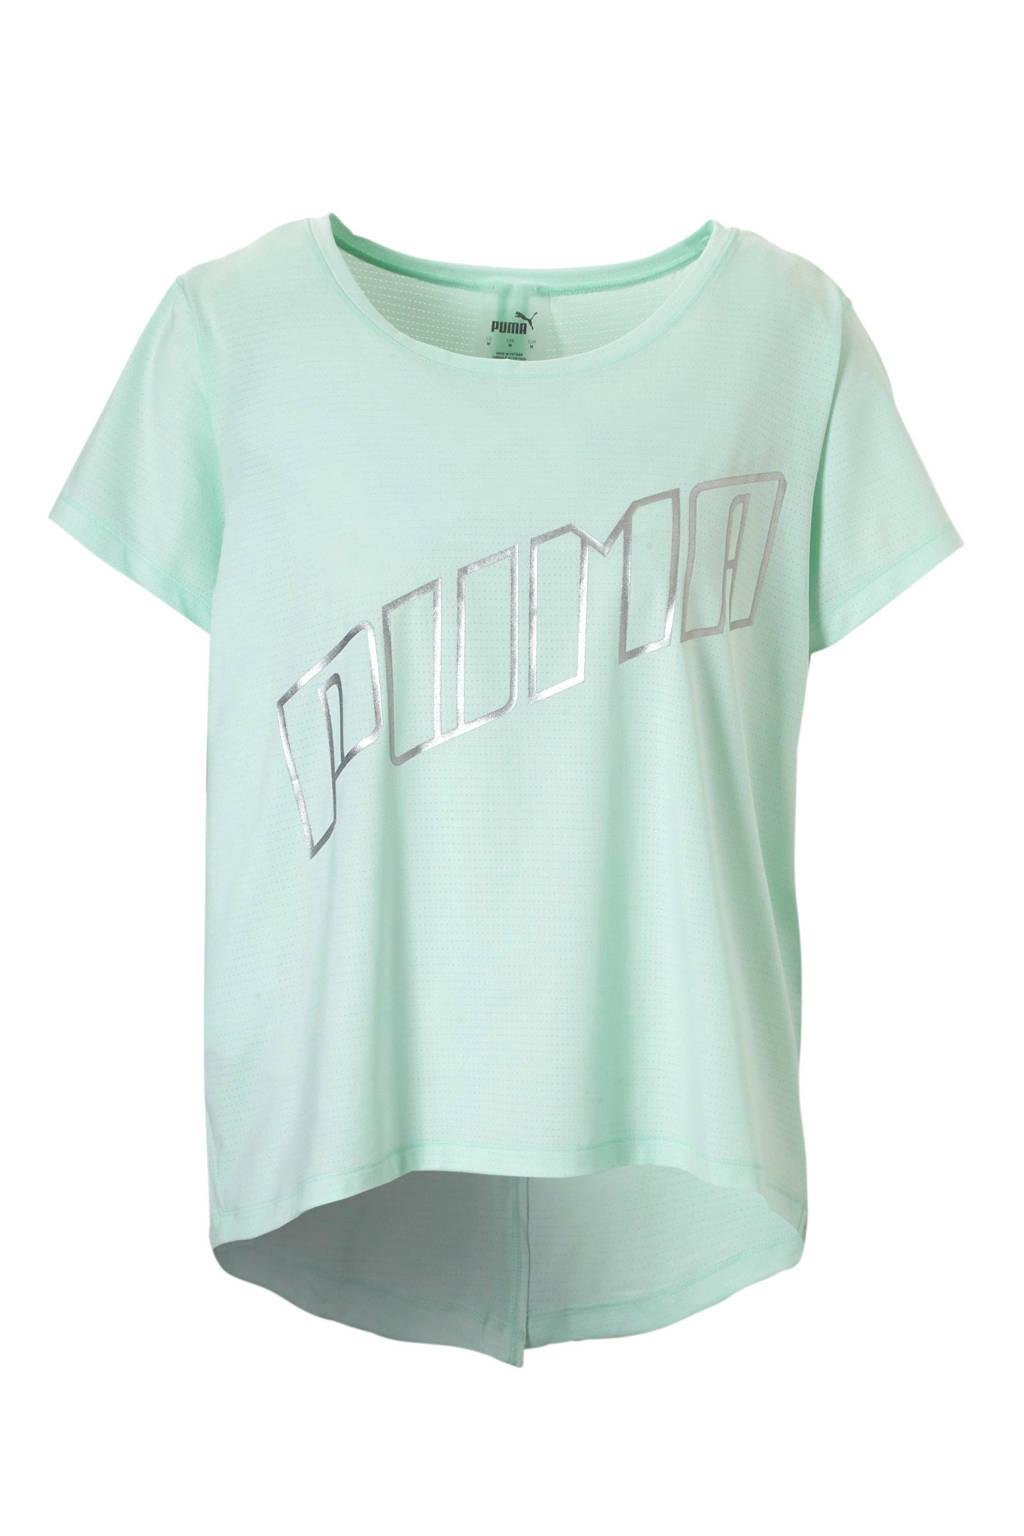 Puma hardloop T-shirt mintgroen, Mintgroen